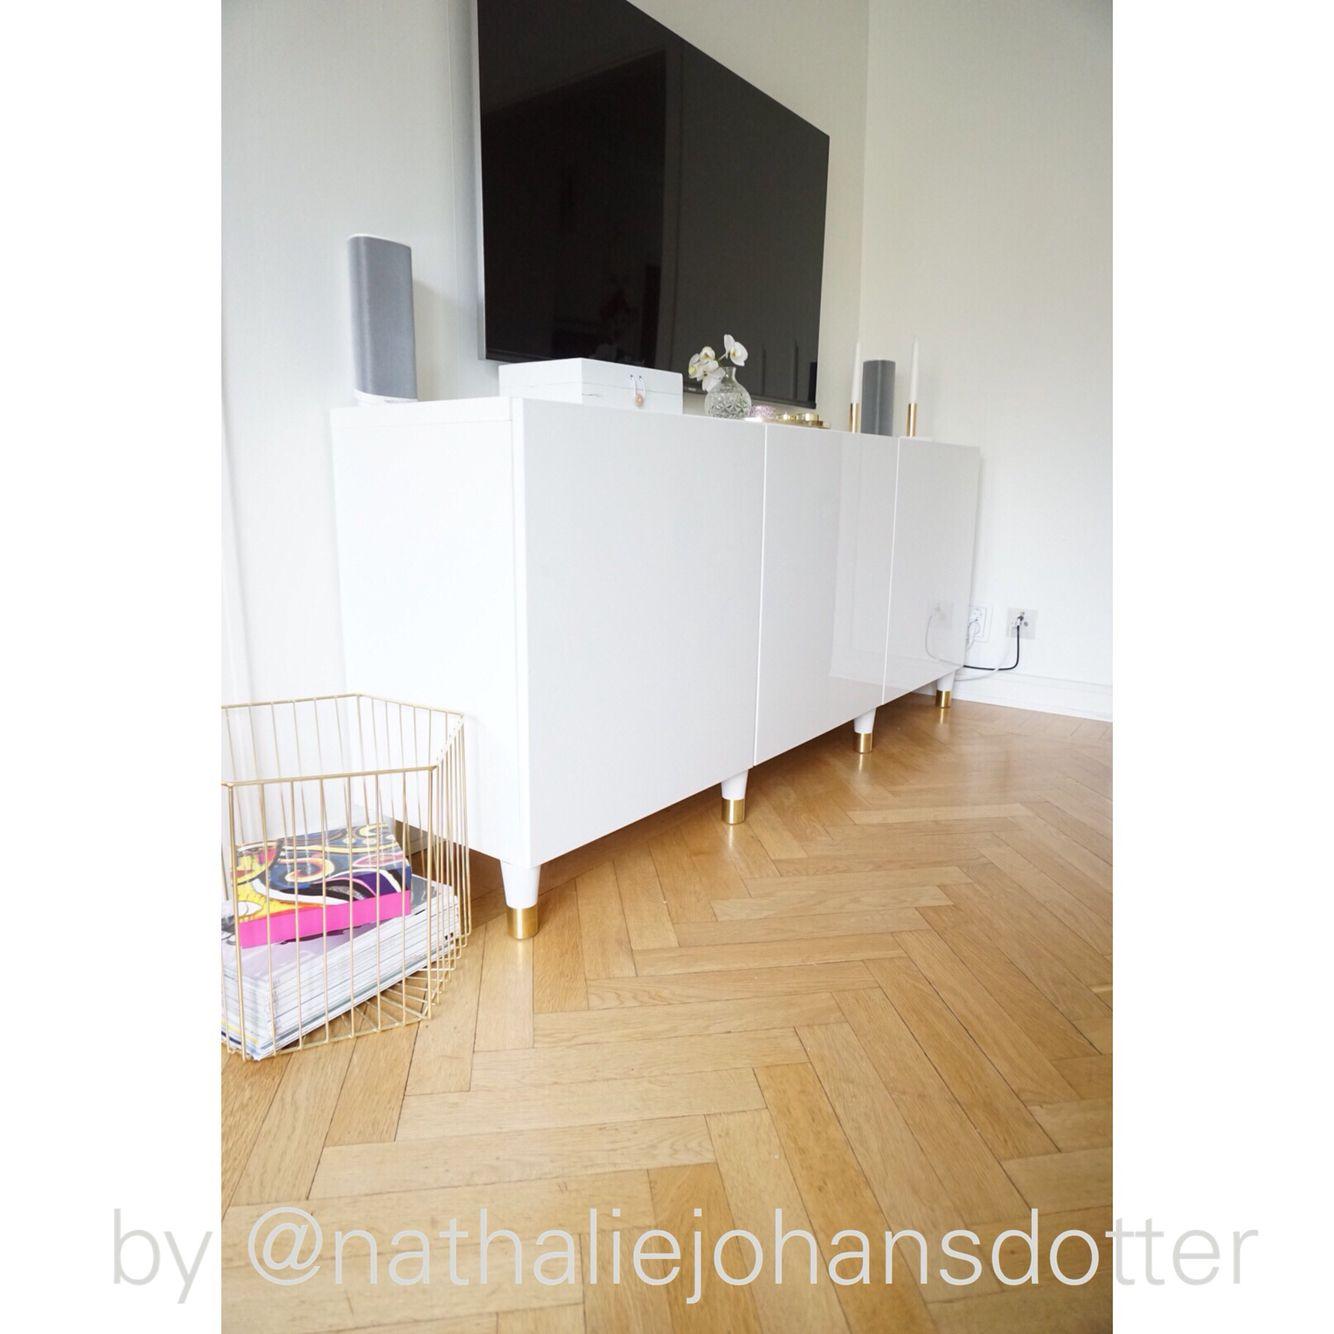 IKEA Bestå Med Prettypegs ✨ By Nathaliejohansdotter